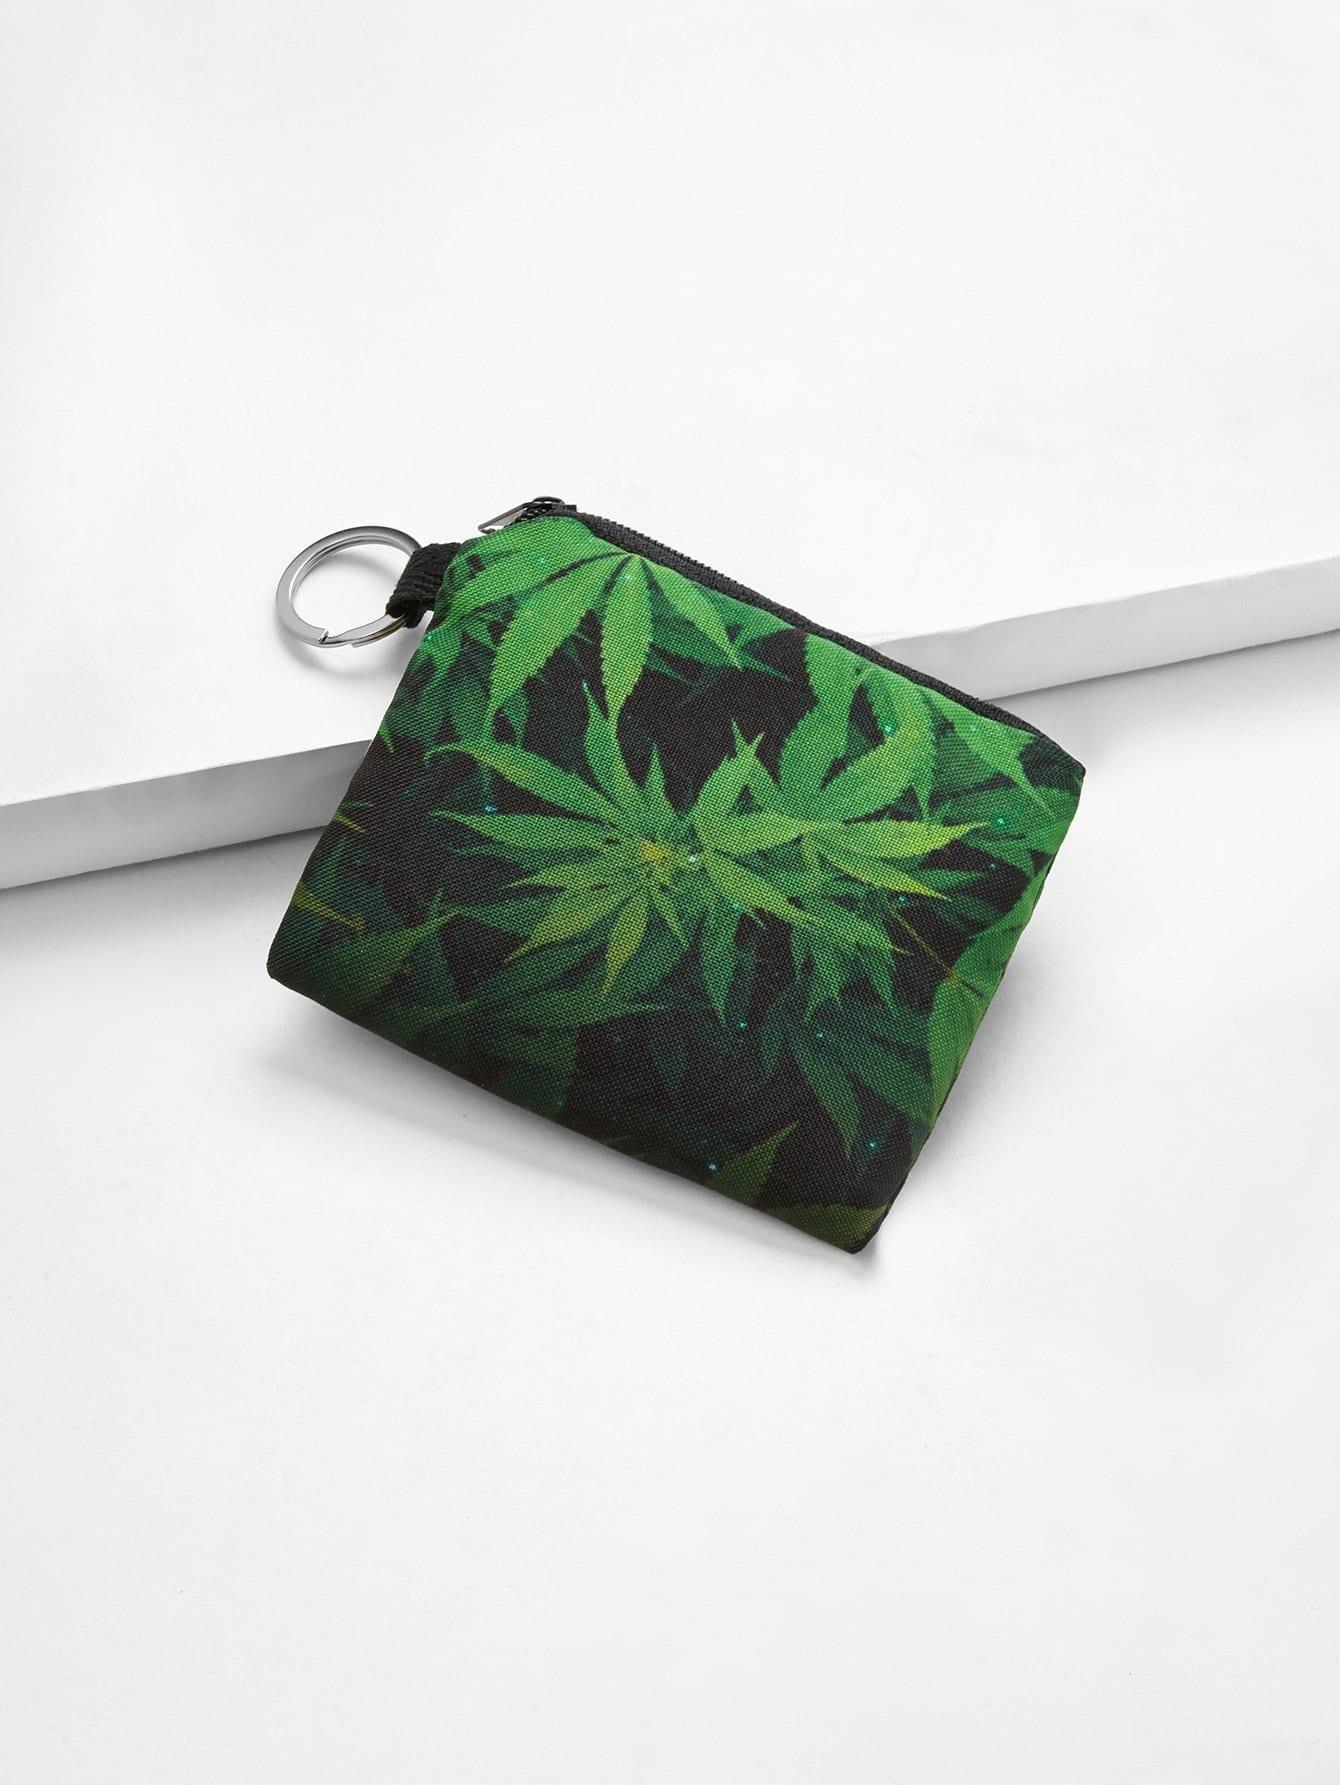 Marijuana Weed Coin Purse growing medical marijuana securely and legally